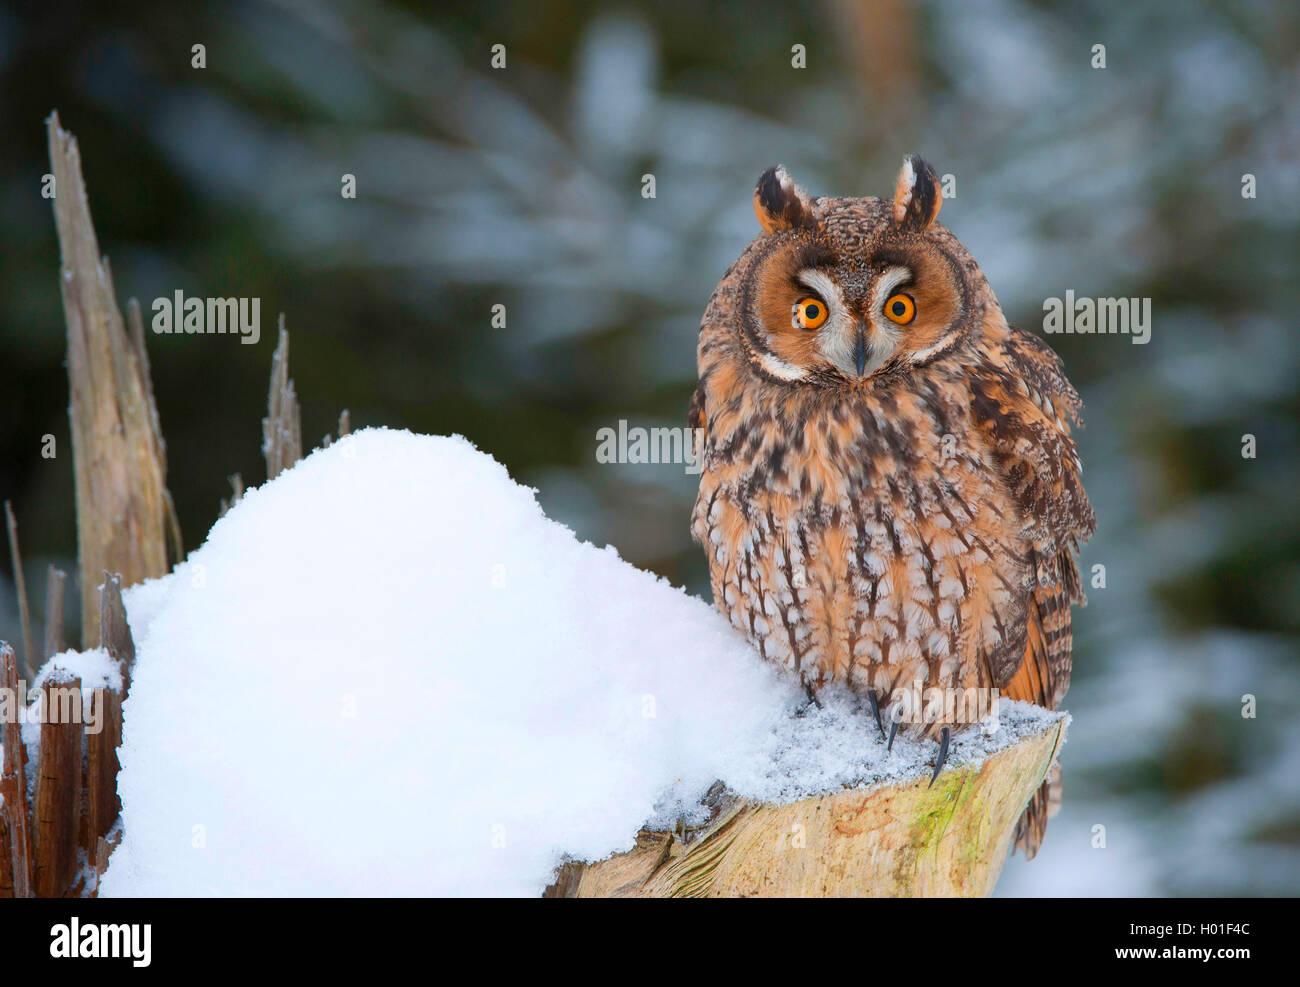 long-eared owl (Asio otus), sitting on a snow-covered tree stump, Germany, Bavaria Stock Photo